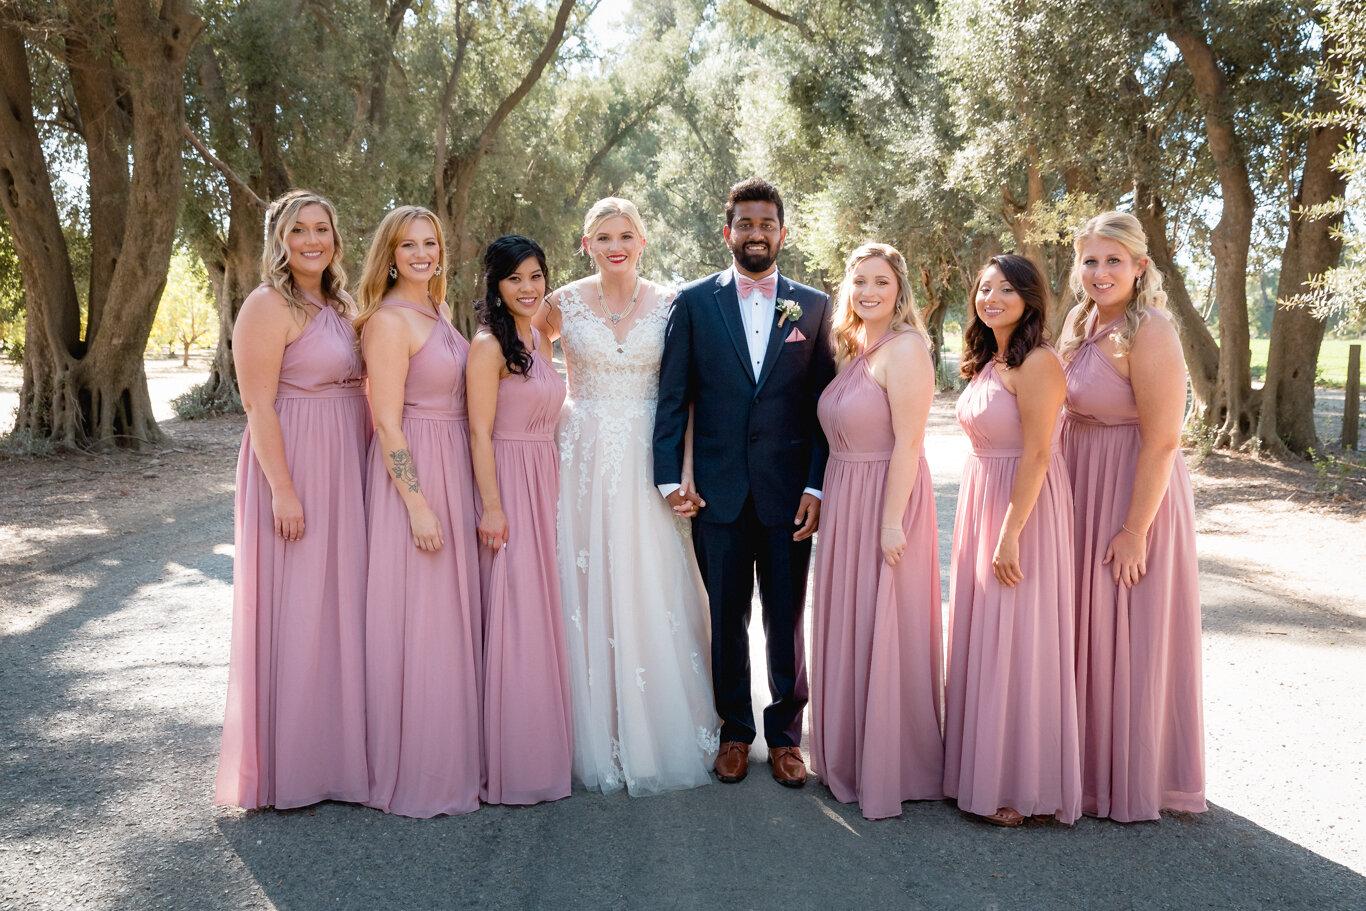 2019.08.24_Emily-Ashir-Wedding-at-the-Maples-5372.jpg